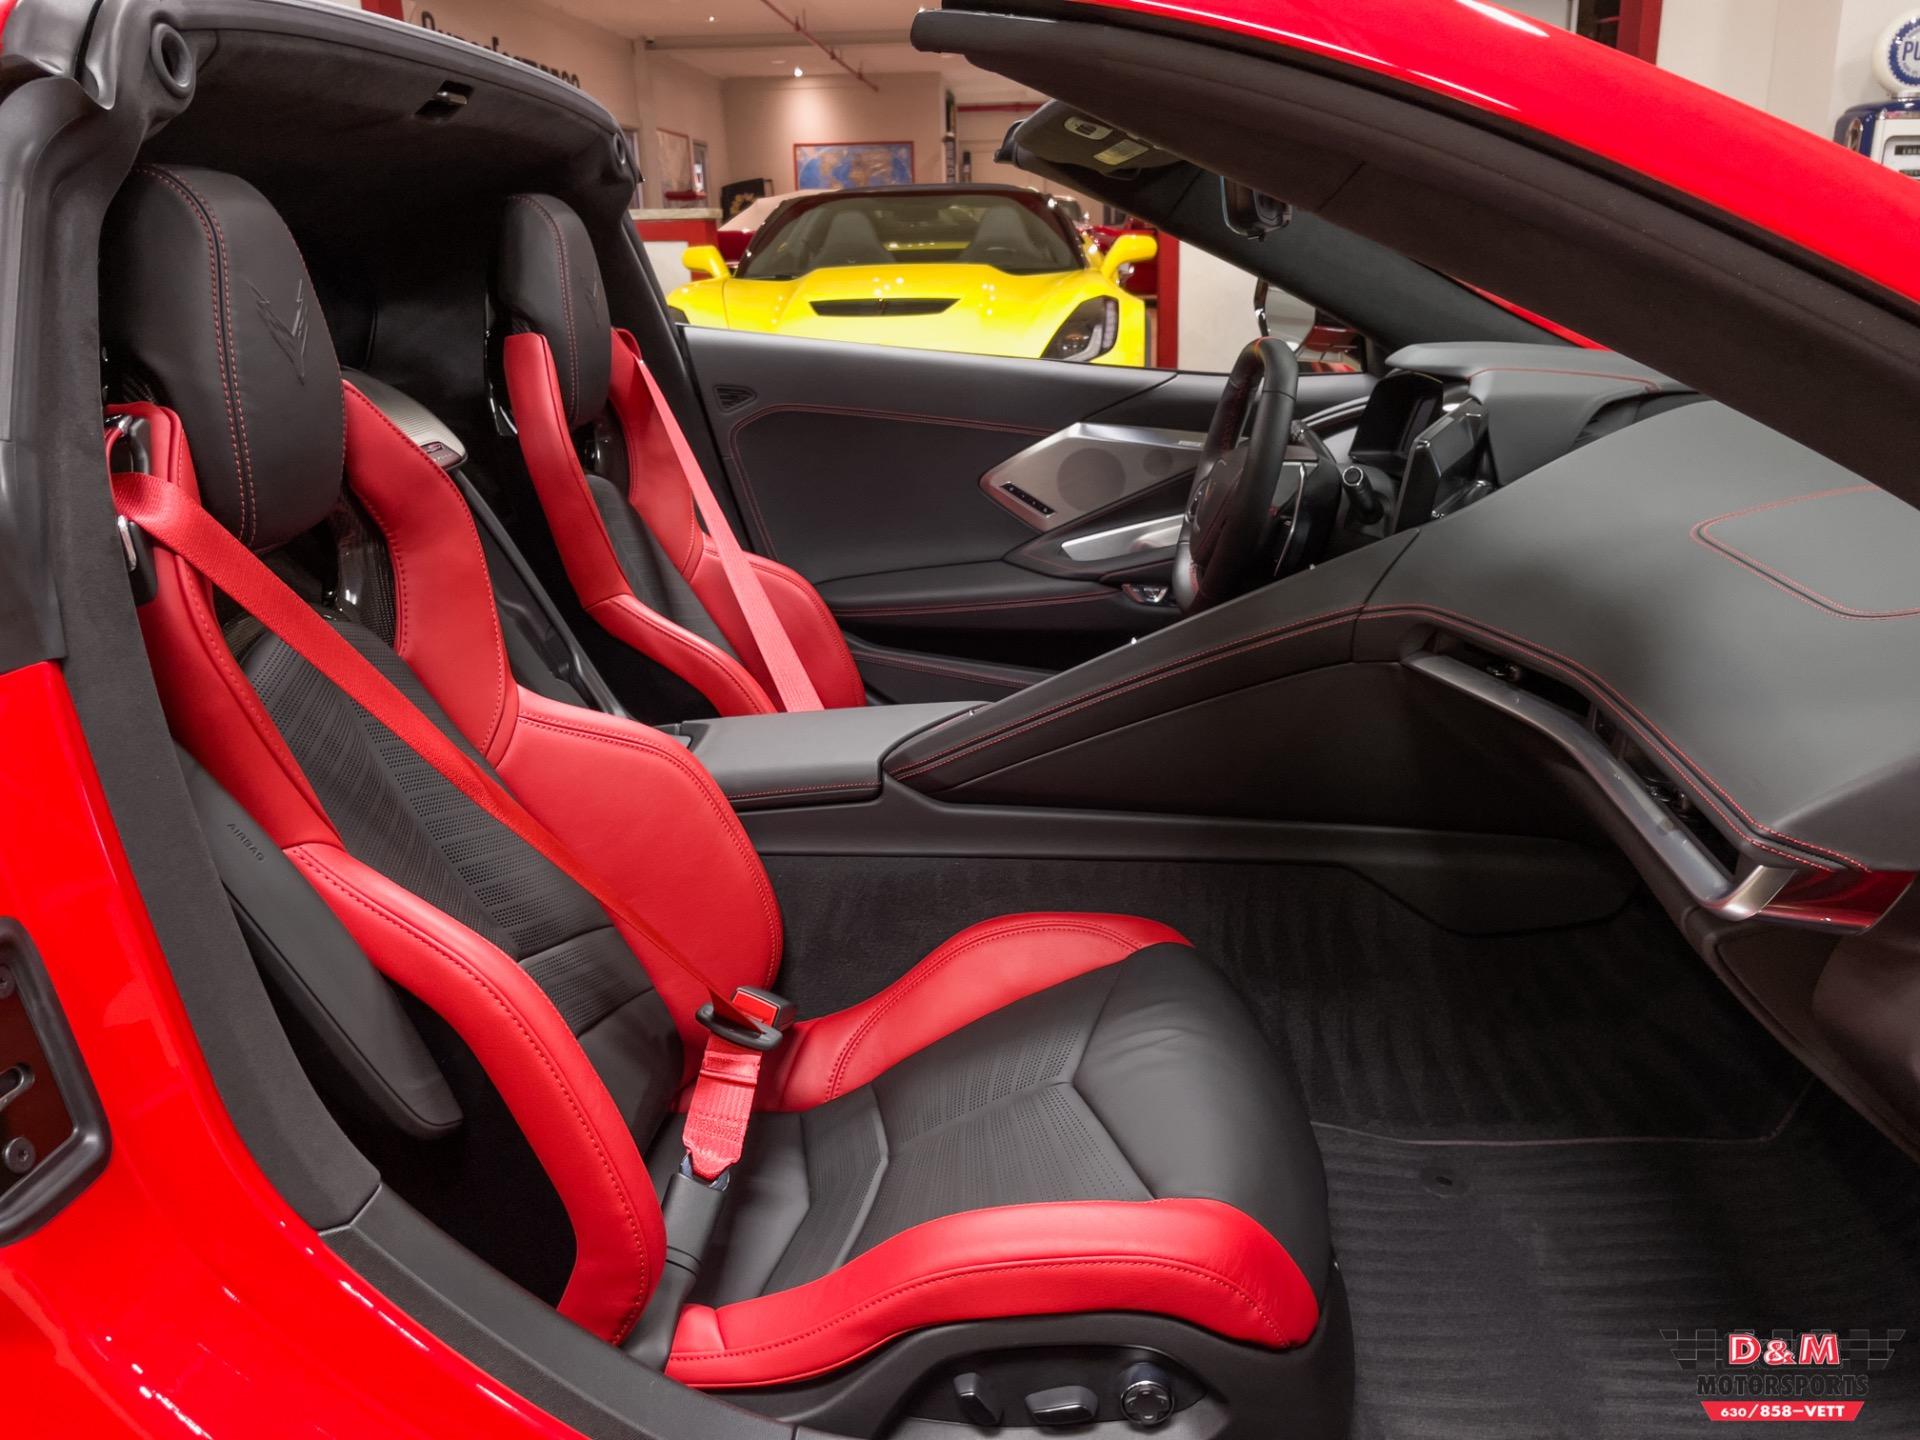 Used 2021 Chevrolet Corvette Stingray Coupe | Glen Ellyn, IL